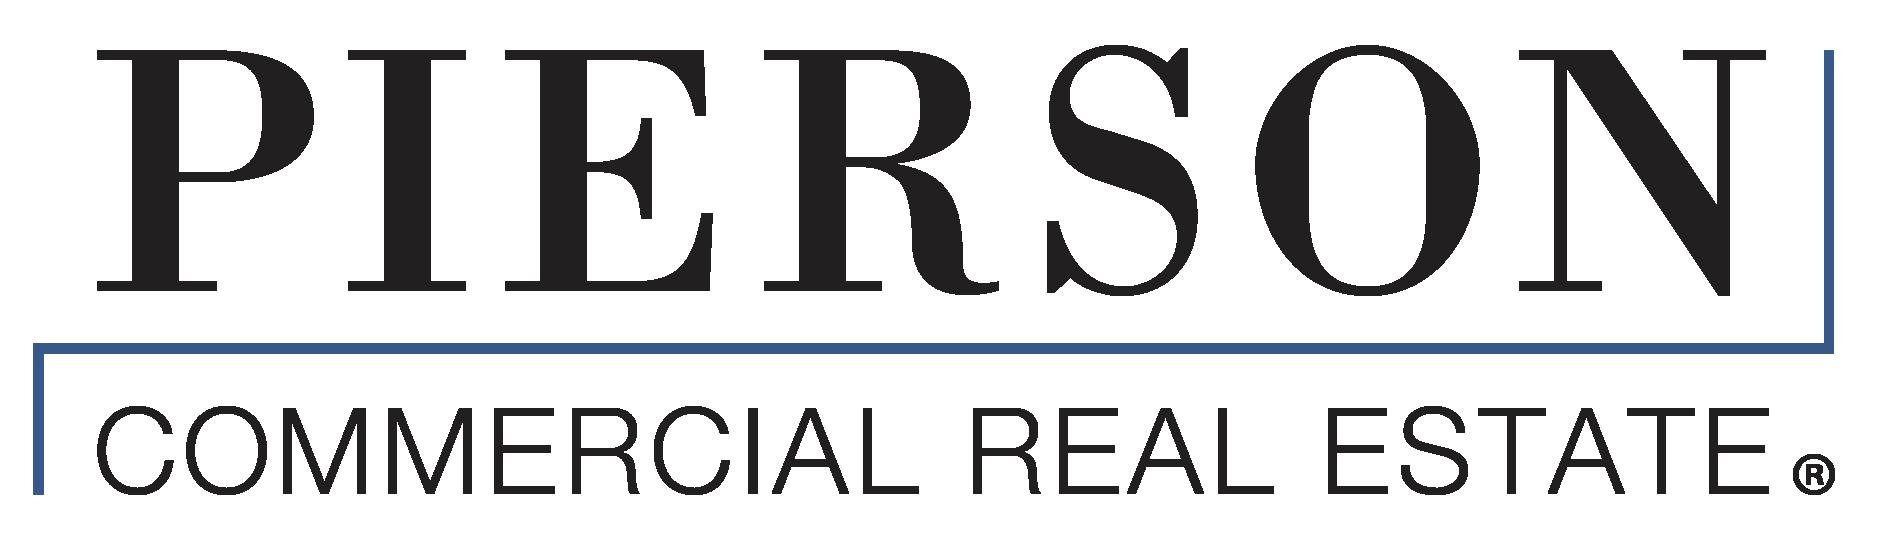 Pierson Commercial Real Estate